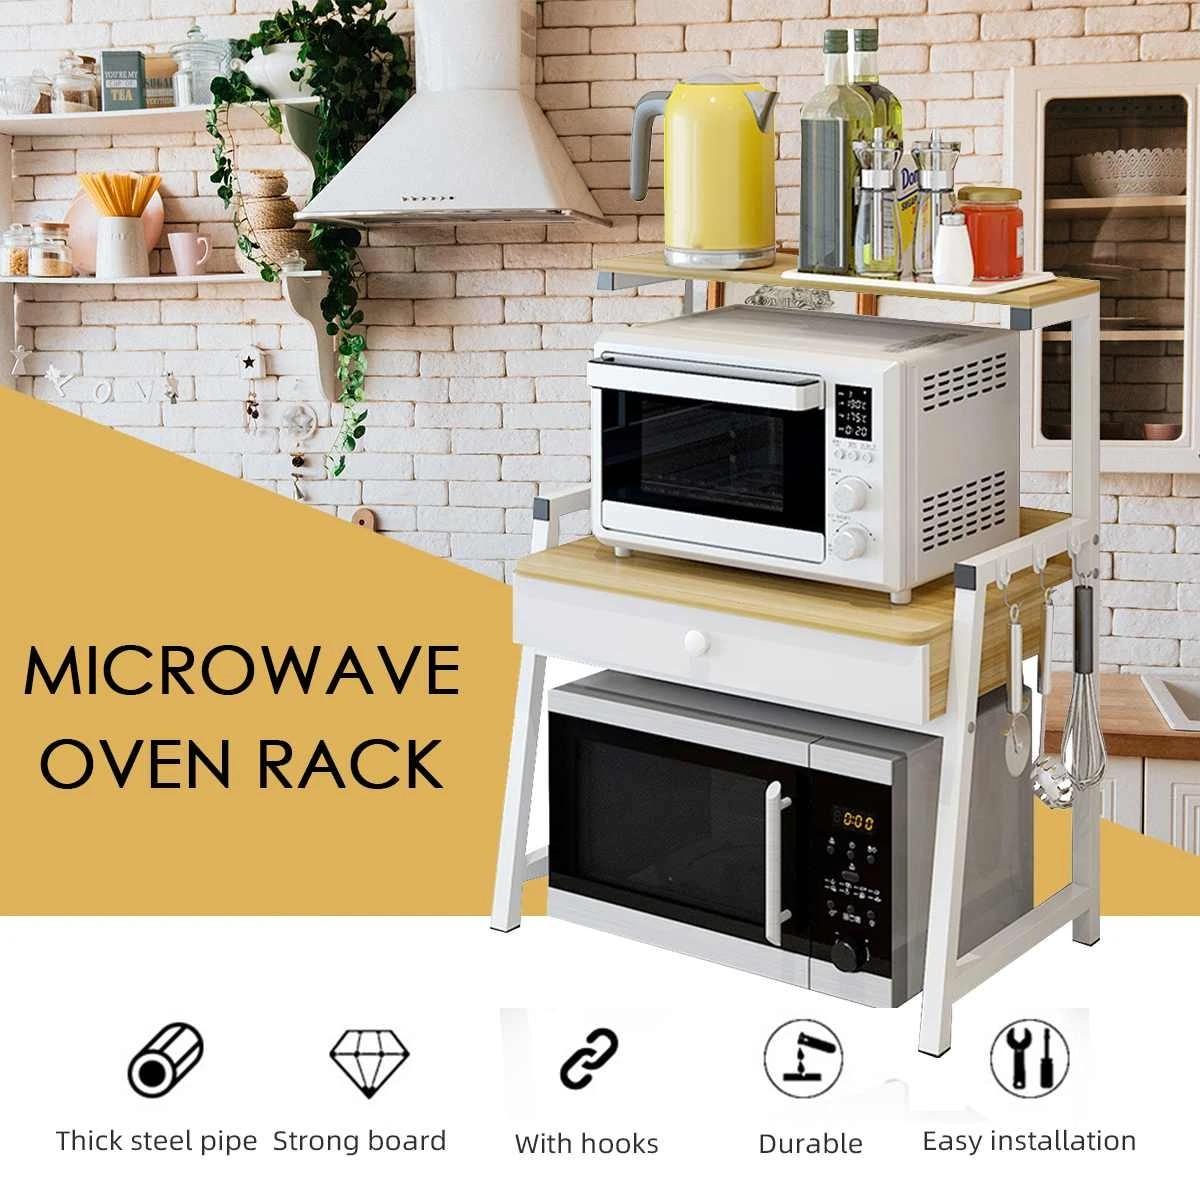 3 Tiers Kitchen Storage Shelf Microwave Oven Rack Stand Organizer With Drawer Steel Frame Wood Board Multifunctional Shelf Racks Holders Aliexpress